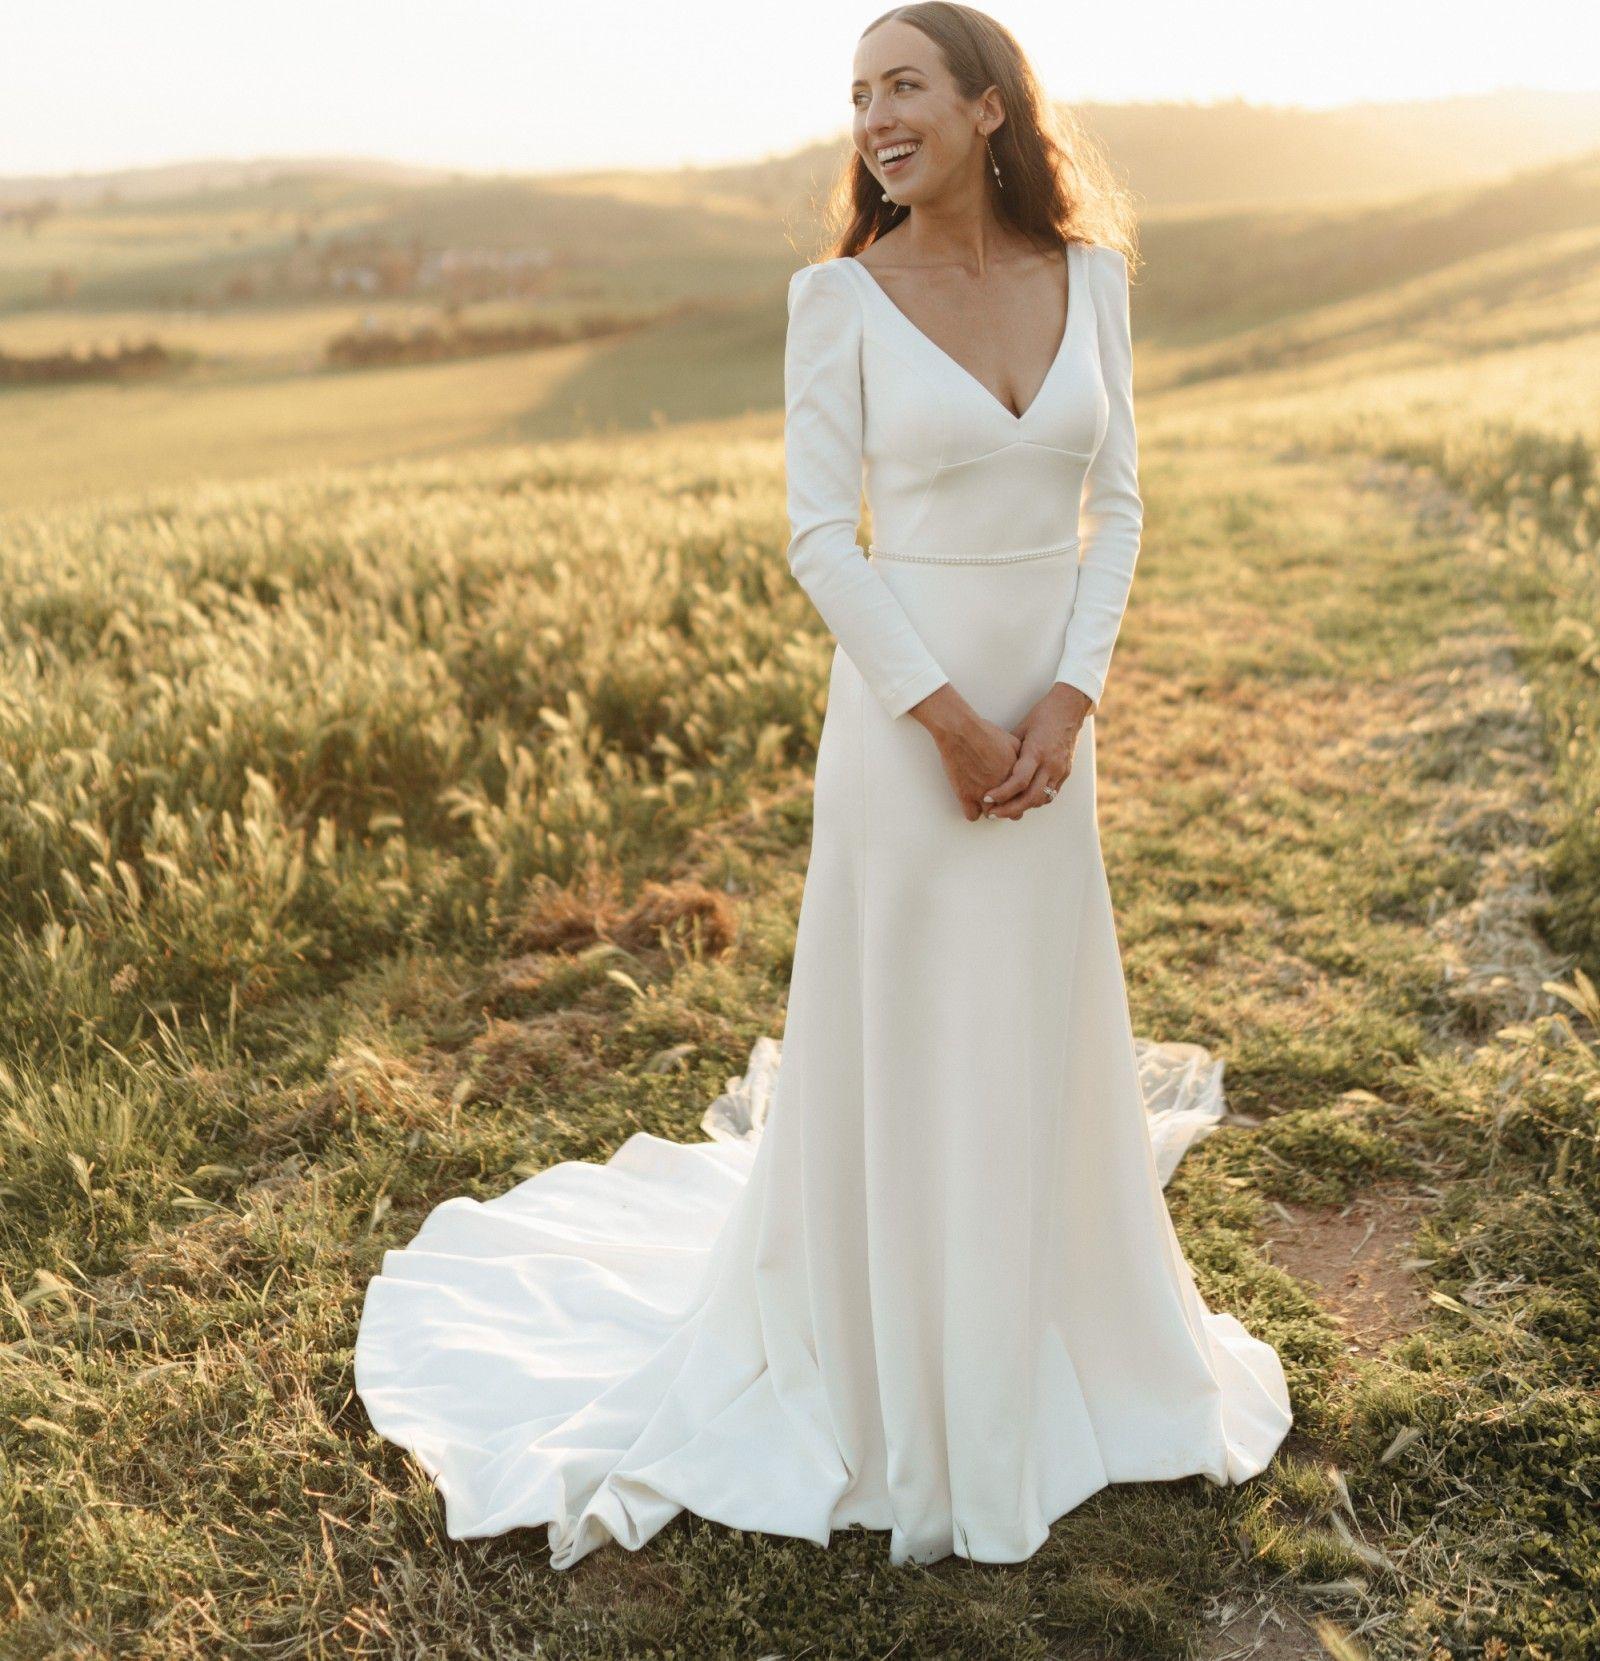 Karen Willis Holmes Aubrey Preowned Wedding Dress Save 49 Preowned Wedding Dresses Dresses Stunning Dresses [ 1661 x 1600 Pixel ]